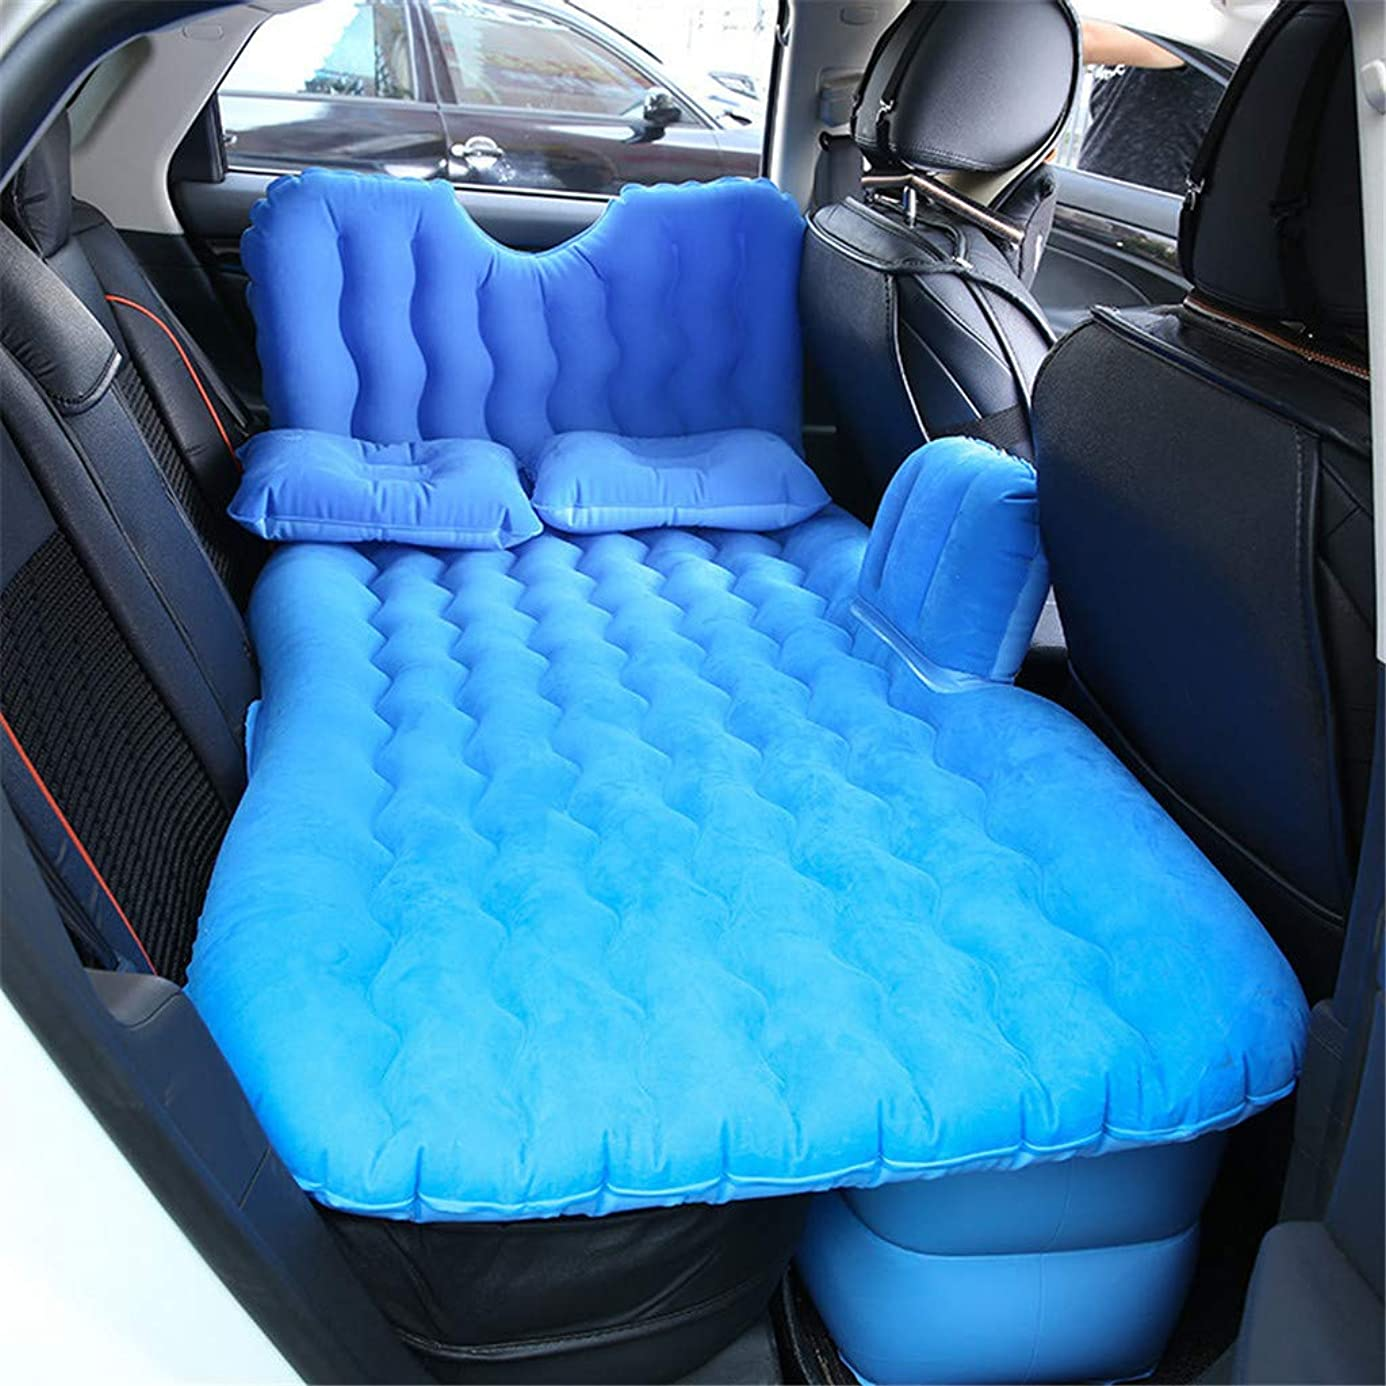 Sinwo Car Inflatable Travel Mattress Air Bed Back Seat Sleep Rest Mat with Pillow/Pump